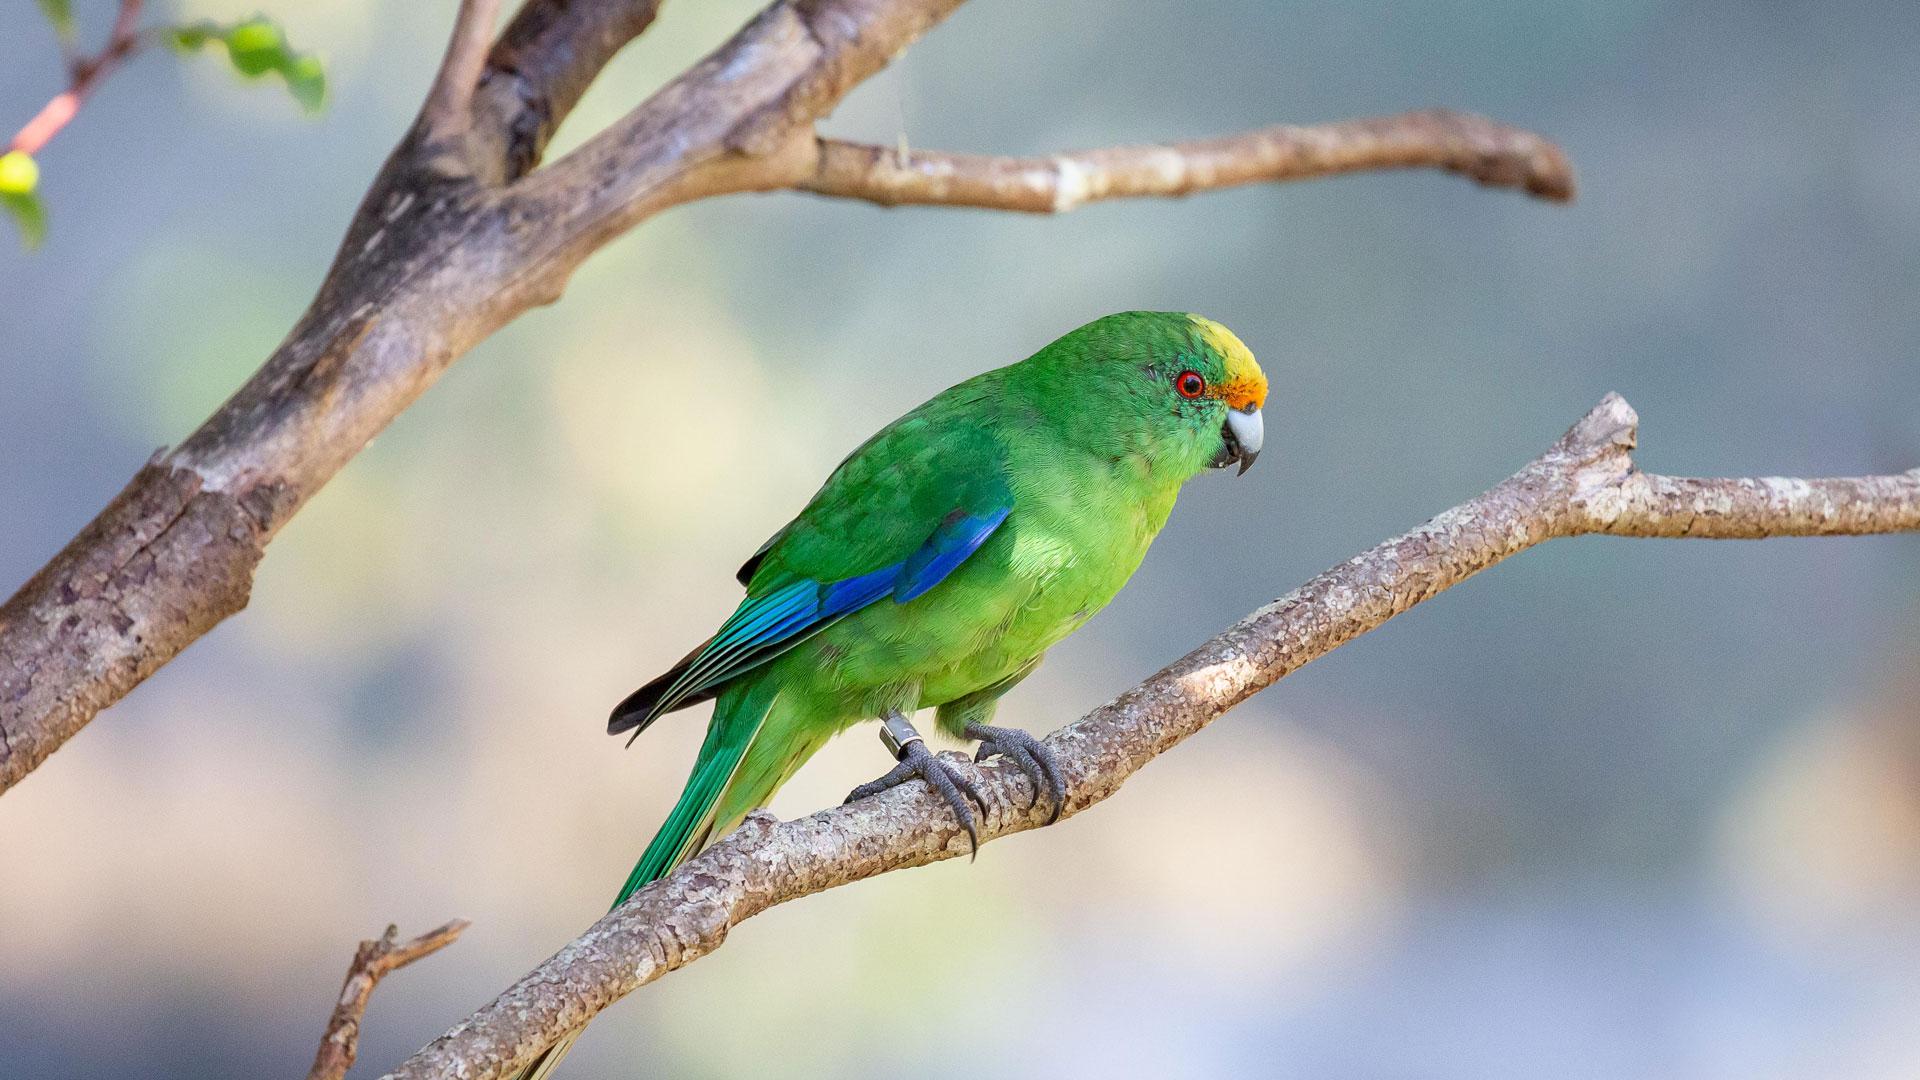 https://rfacdn.nz/zoo/assets/media/orange-fronted-kakariki-chicks-gallery-6.jpg